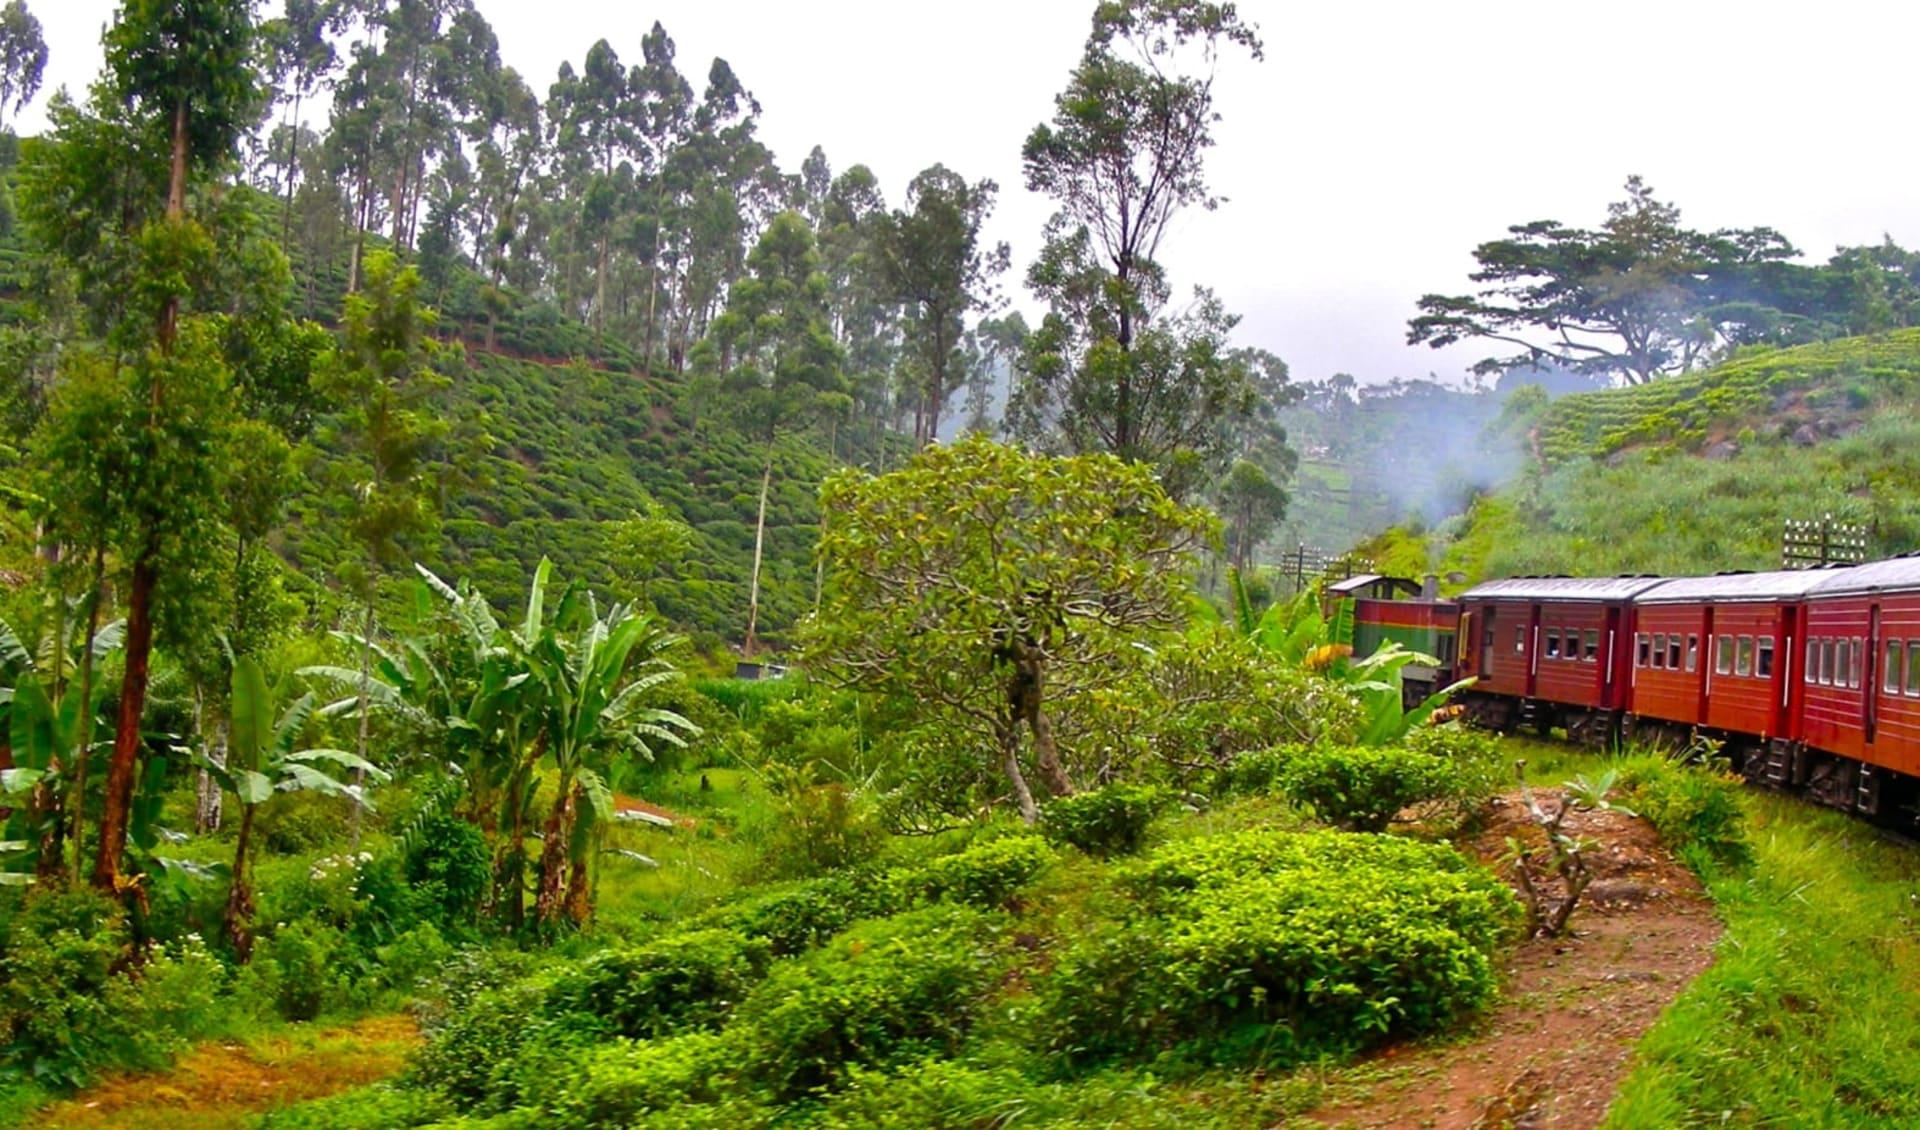 Höhepunkte Sri Lankas ab Colombo: Nuwara Eliya train ride